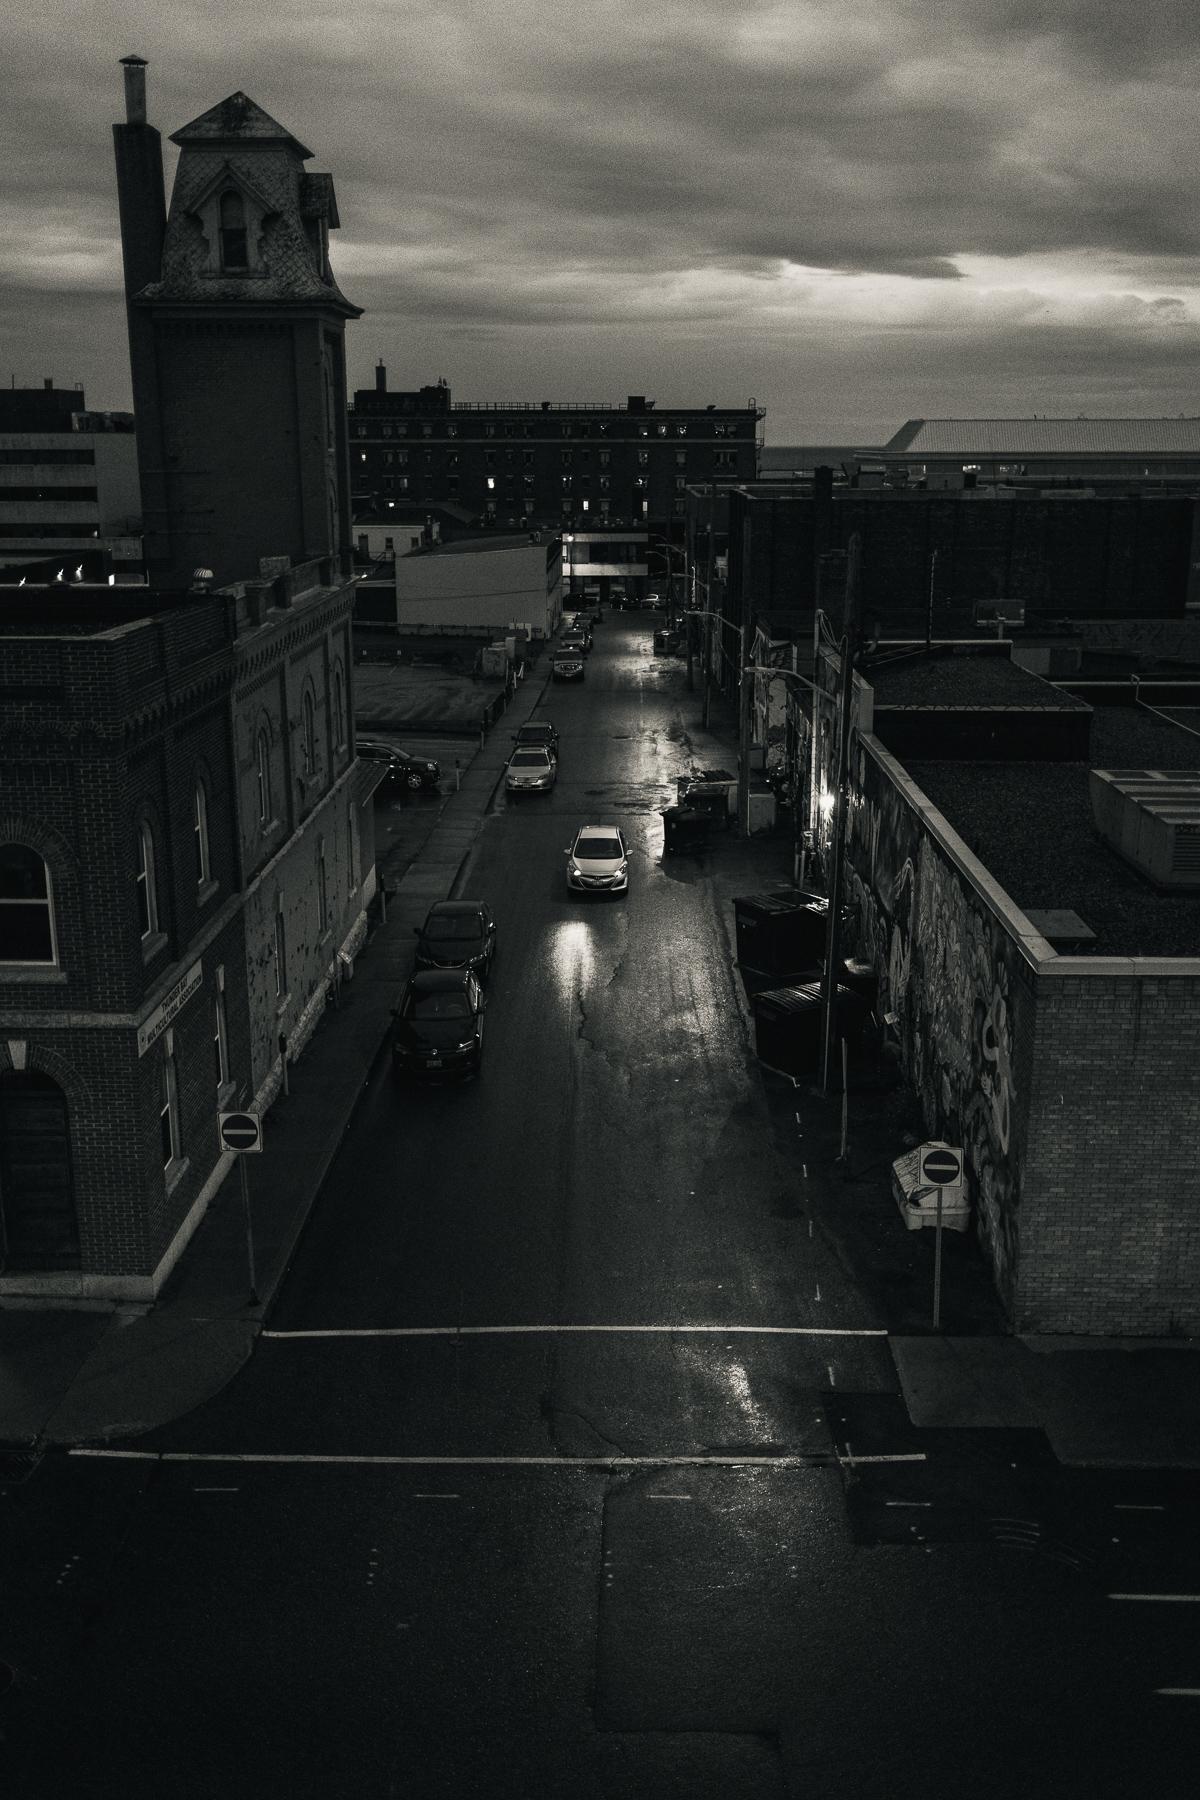 night-walk-anne-august-27th-blog-5.jpg